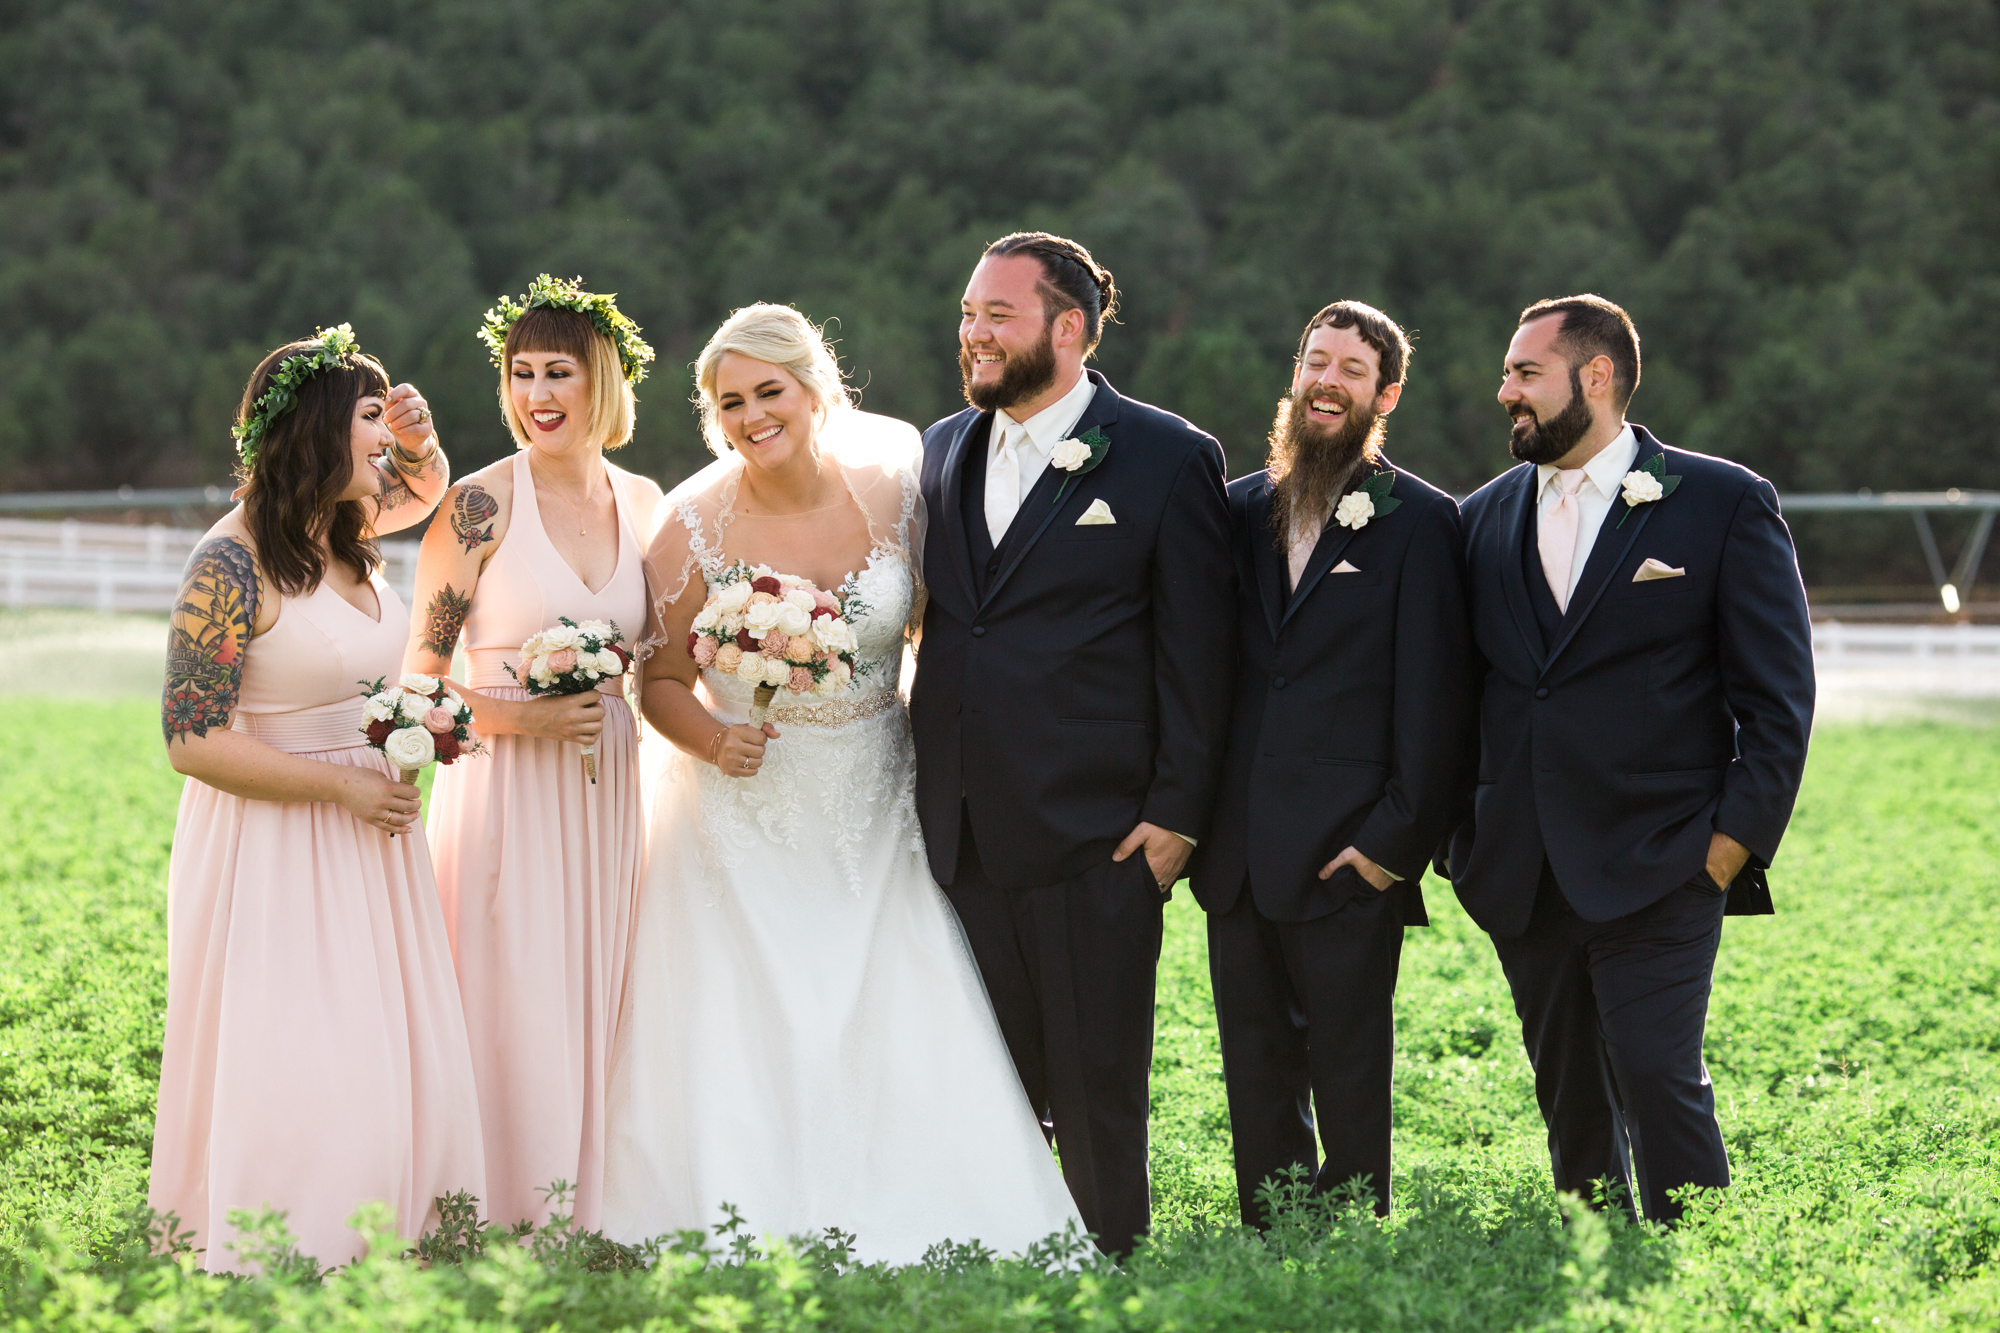 Kelcie-Ryan-Wedding-blog-45.jpg